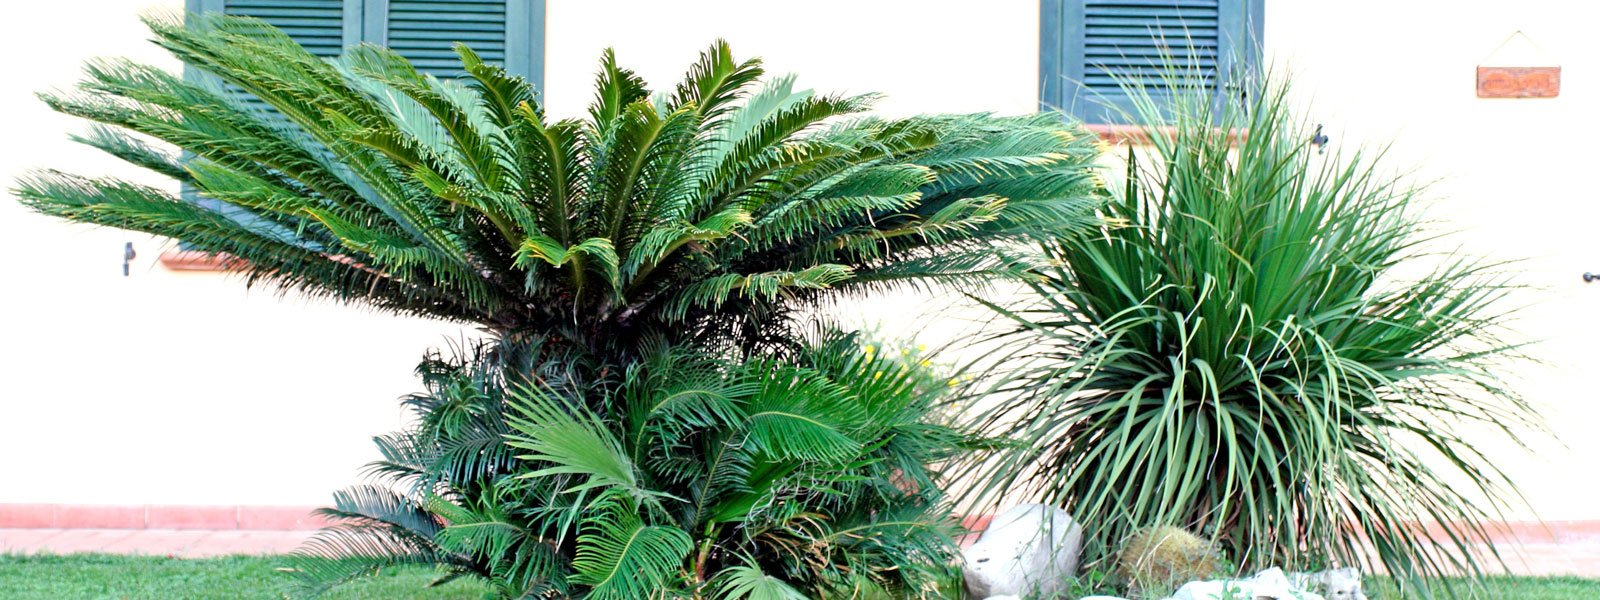 Una palma in giardino s o no cose di casa - Radici palma ...